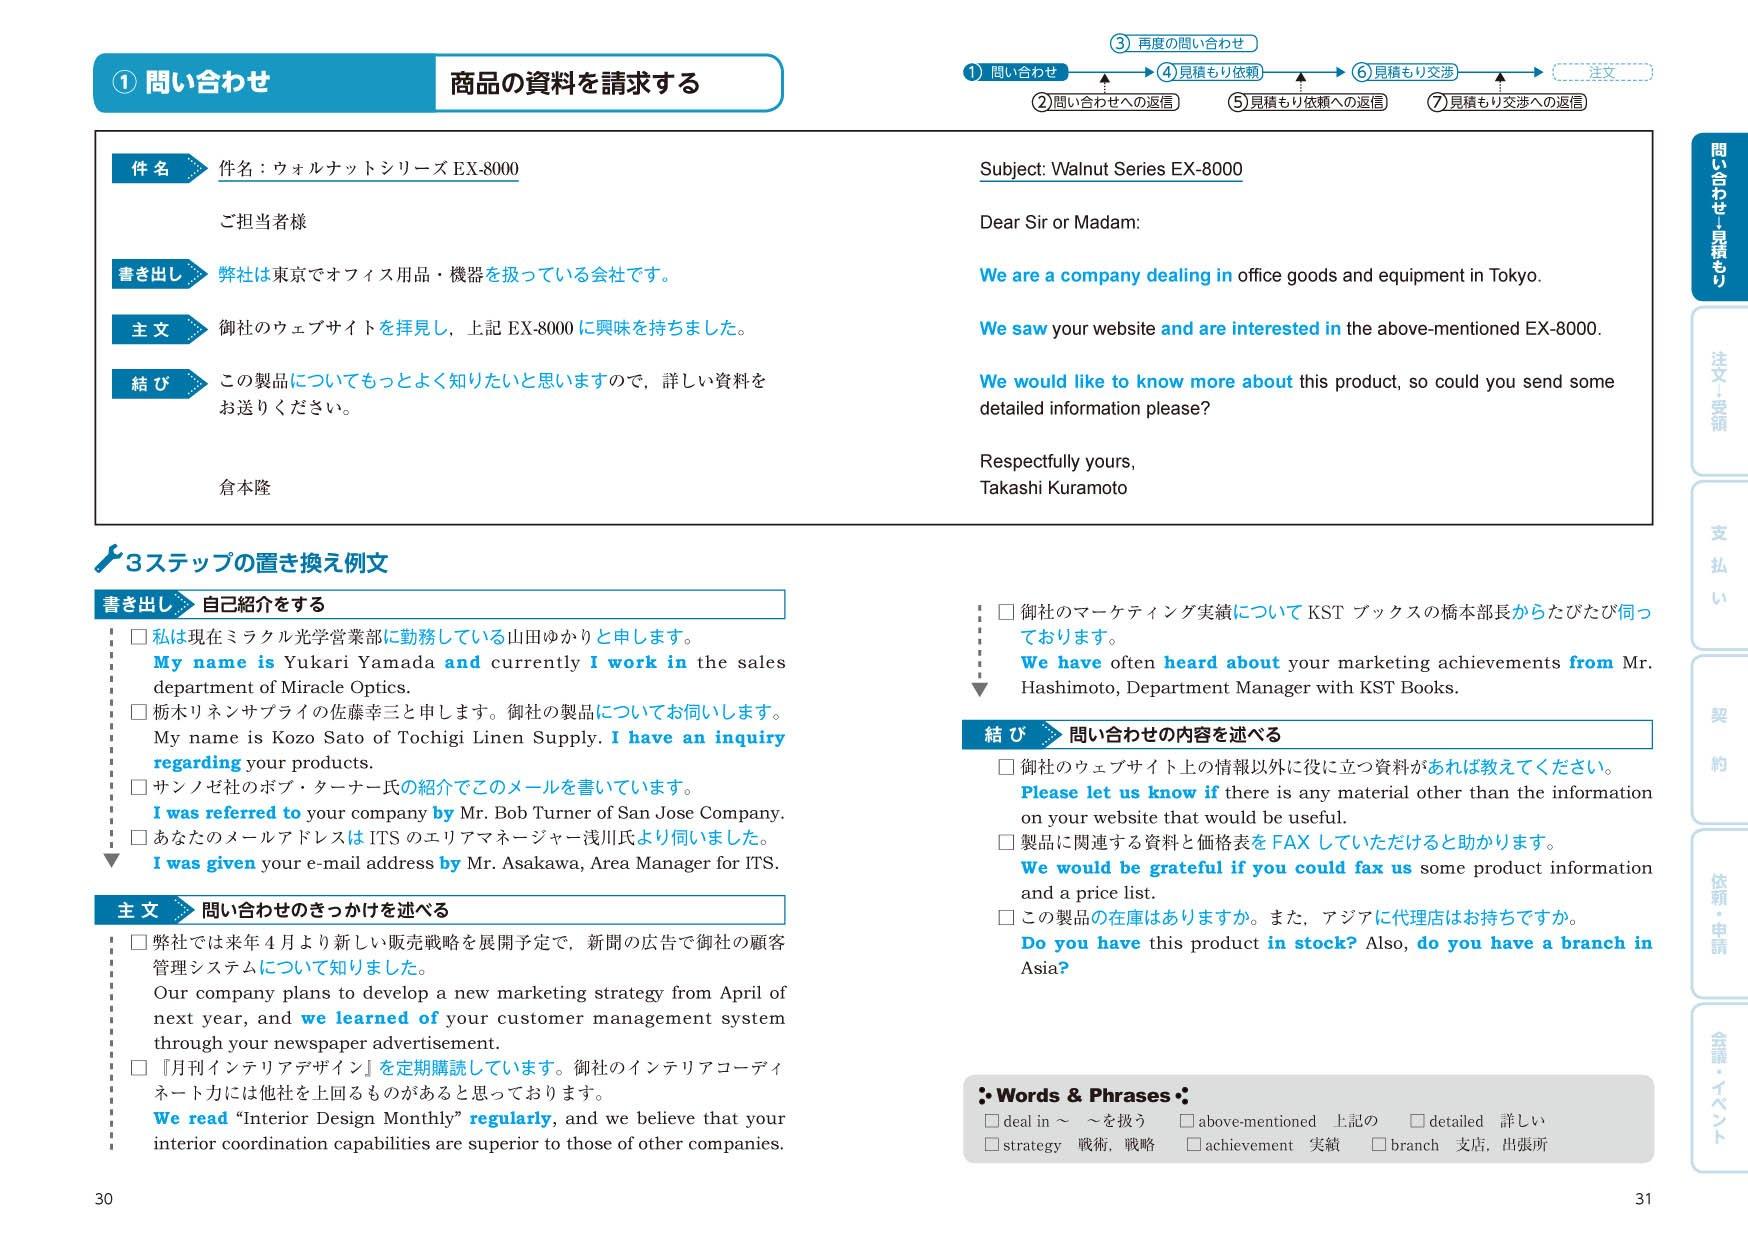 https://images-na.ssl-images-amazon.com/images/I/814dWFxkhTL.jpg